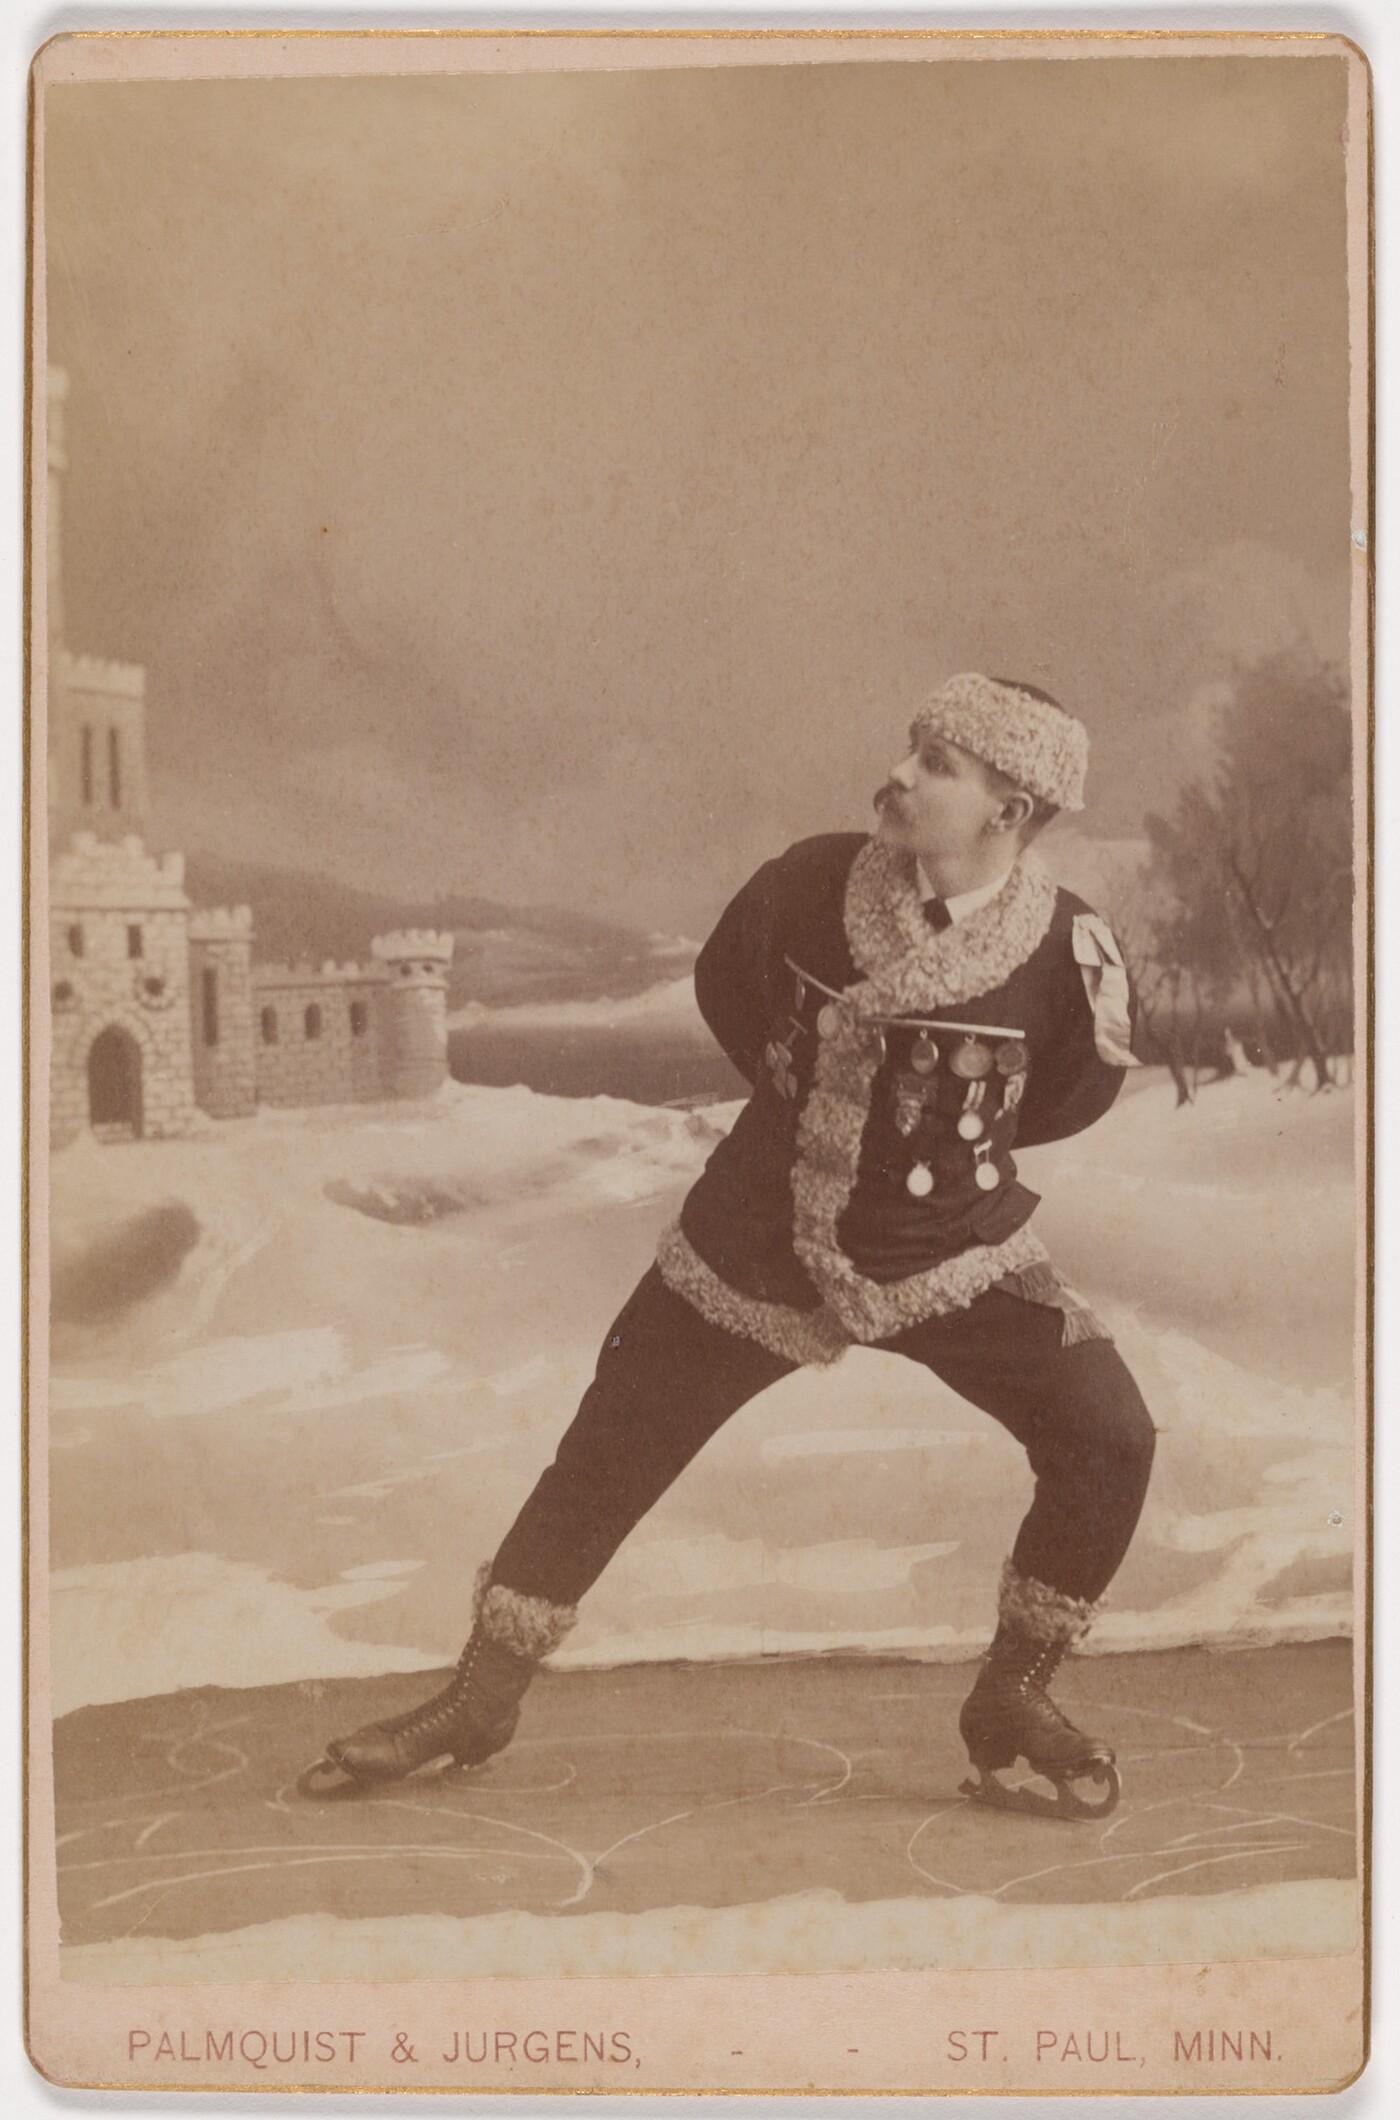 Unknown, [Untitled], 1880s, albumen silver print